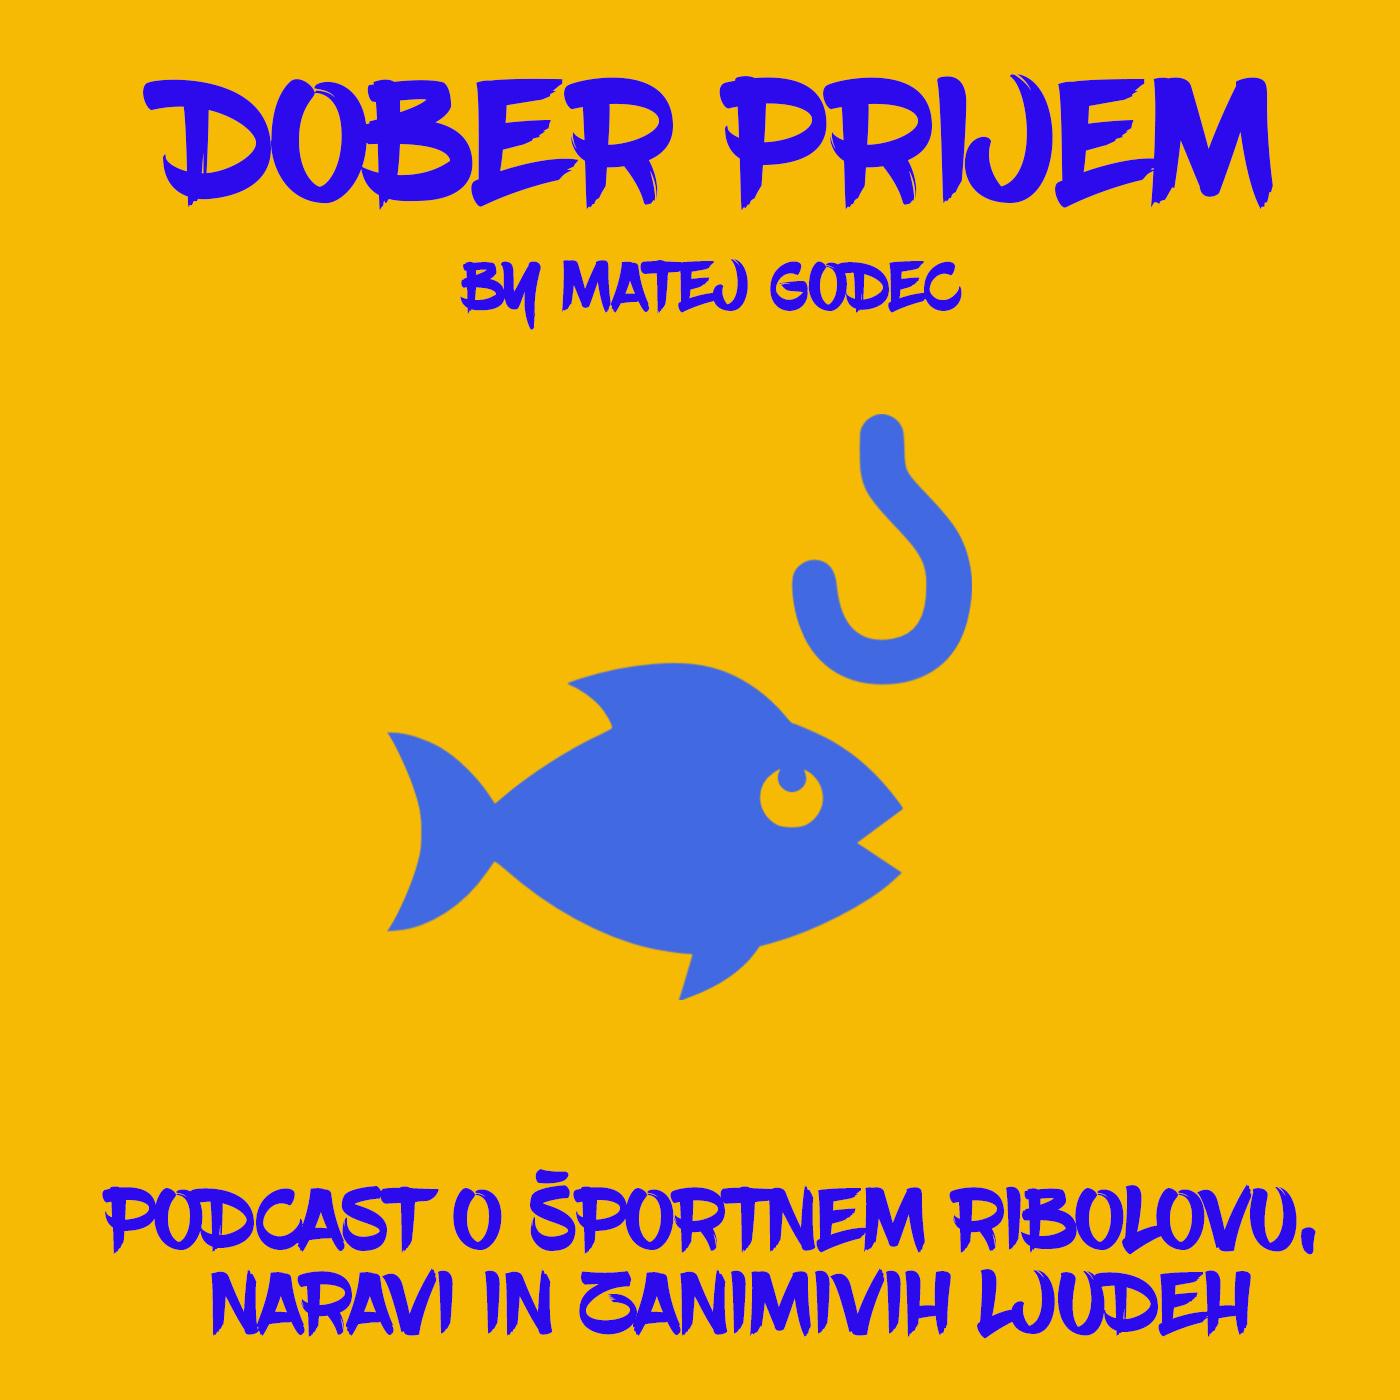 Dober prijem podcast by Matej Godec